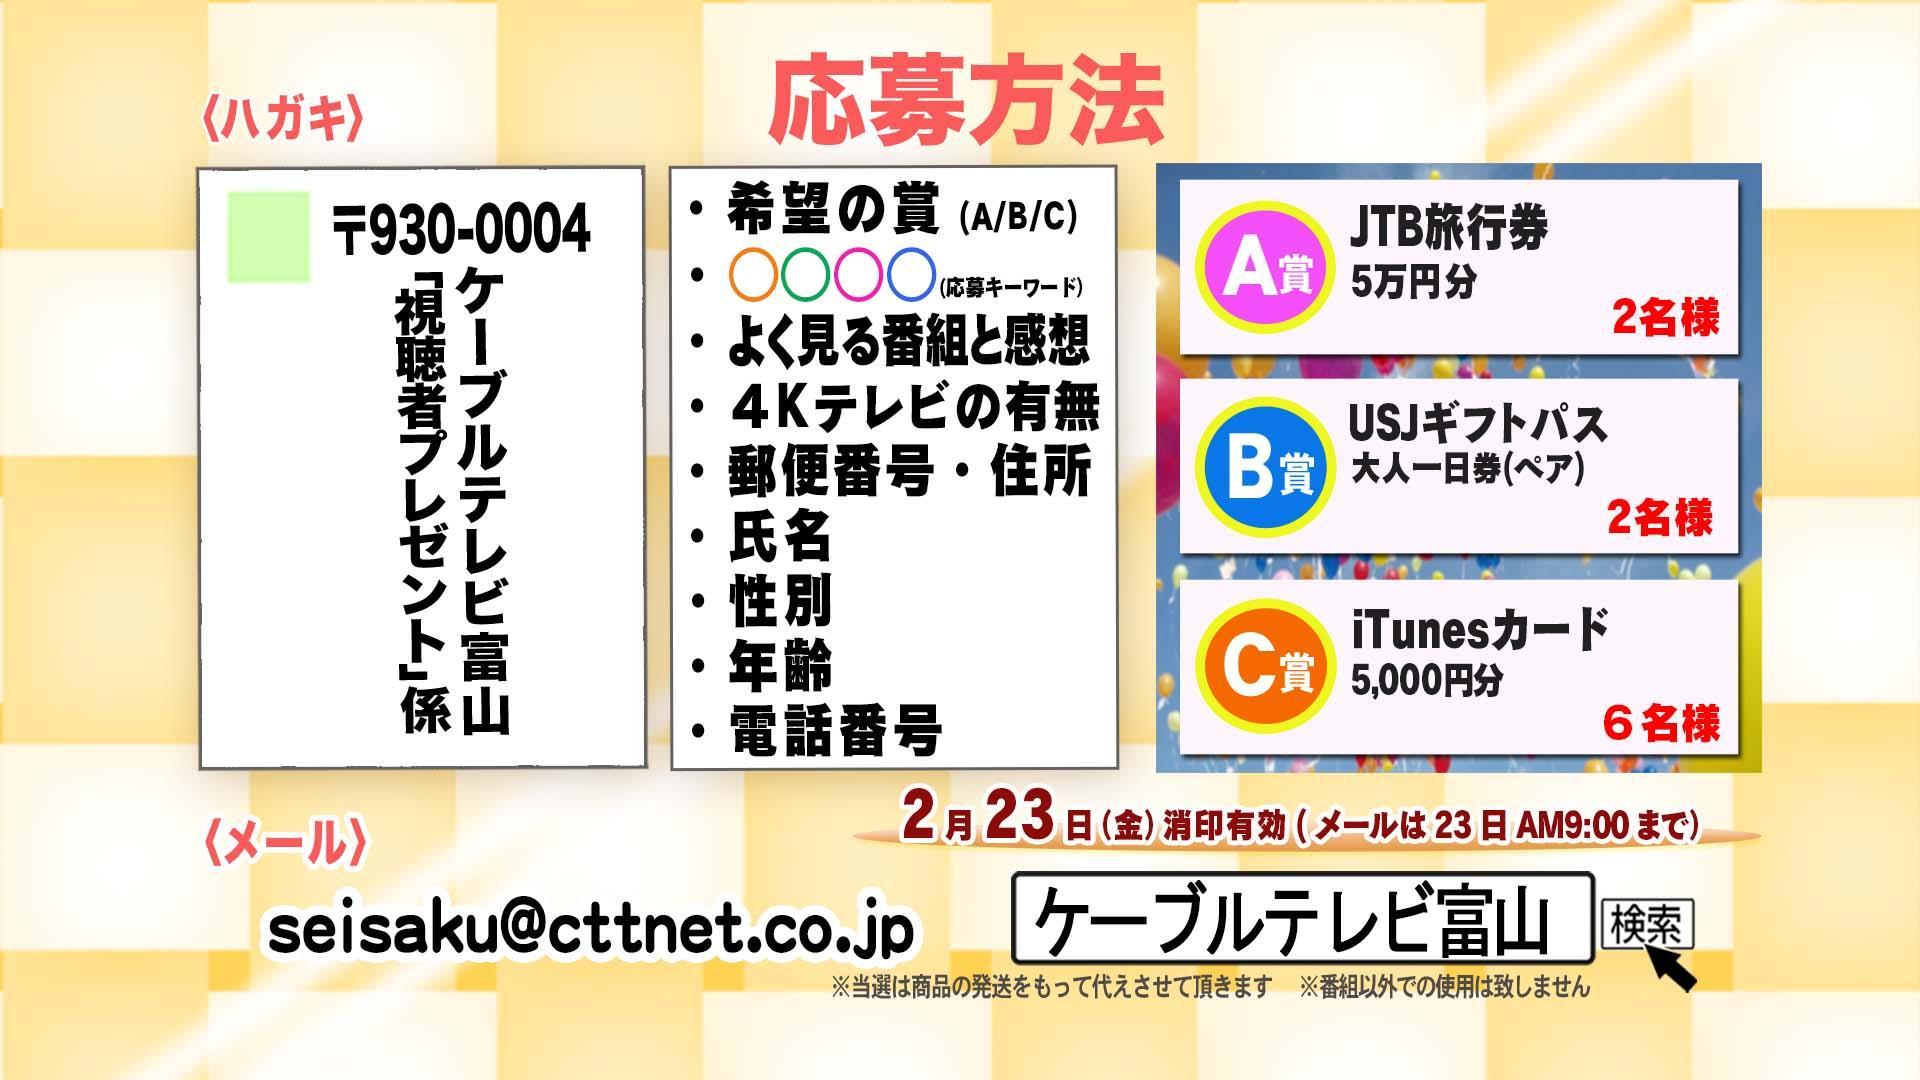 http://ctt.ne.jp/comichan/8fa3eb54f37fa307ab7e8917ef1cca29a3a8c31e.jpg